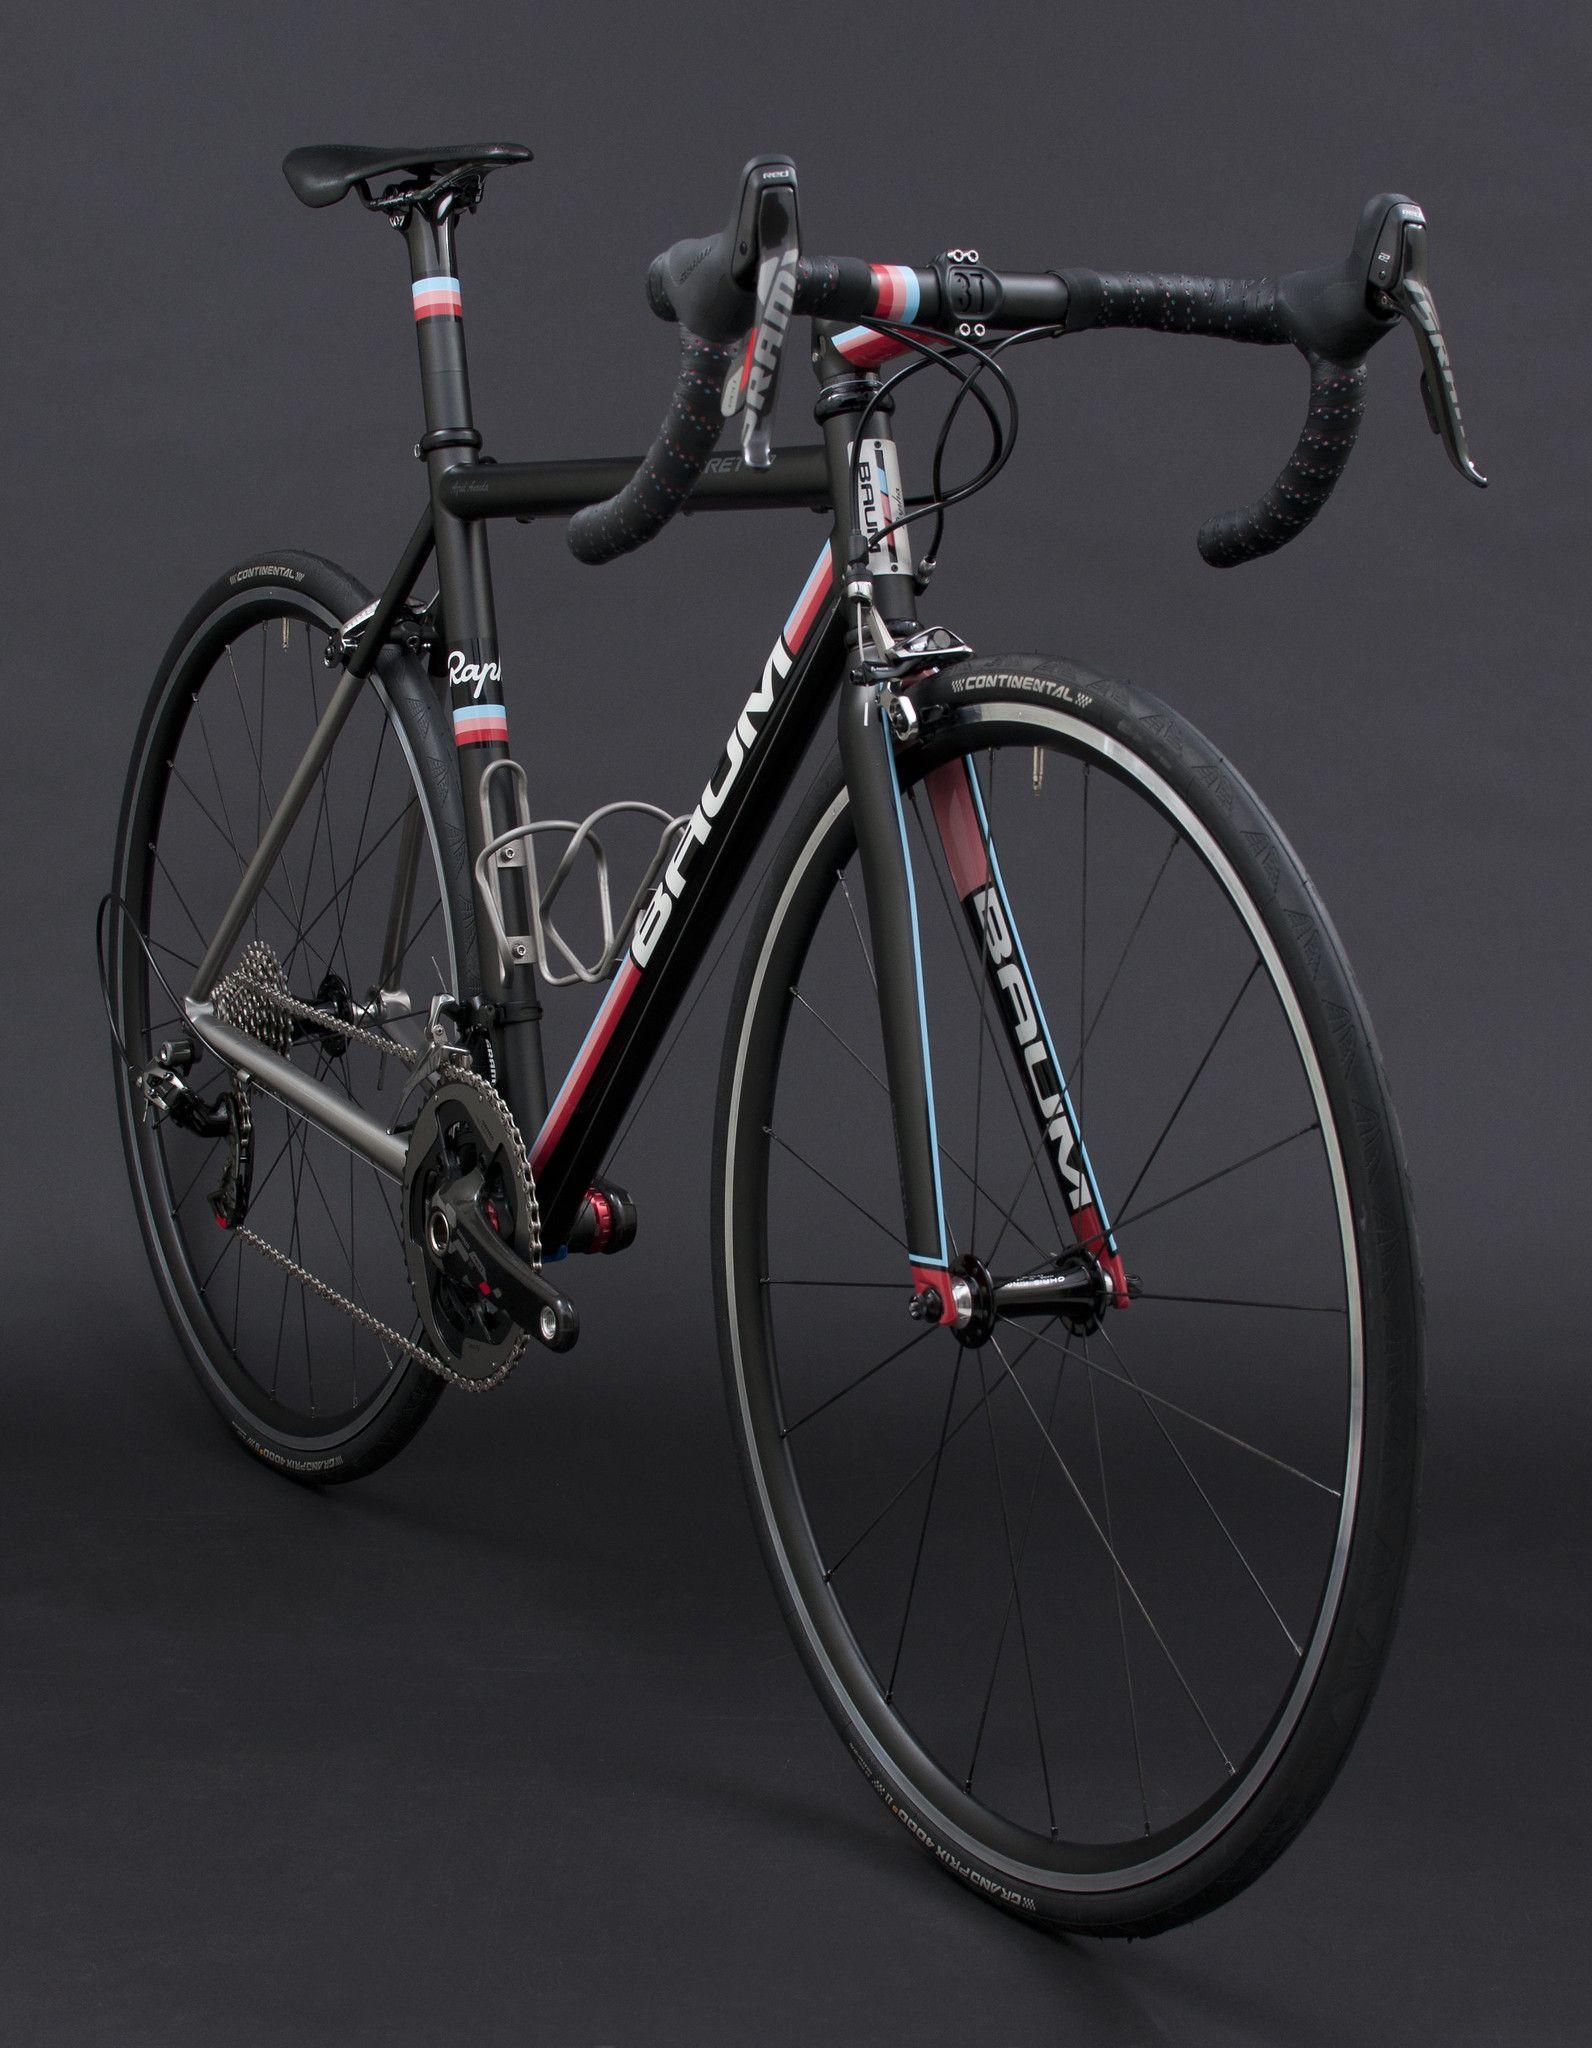 Gta Matte Avon Black Rapha Blue Red Pink Corretto Bike